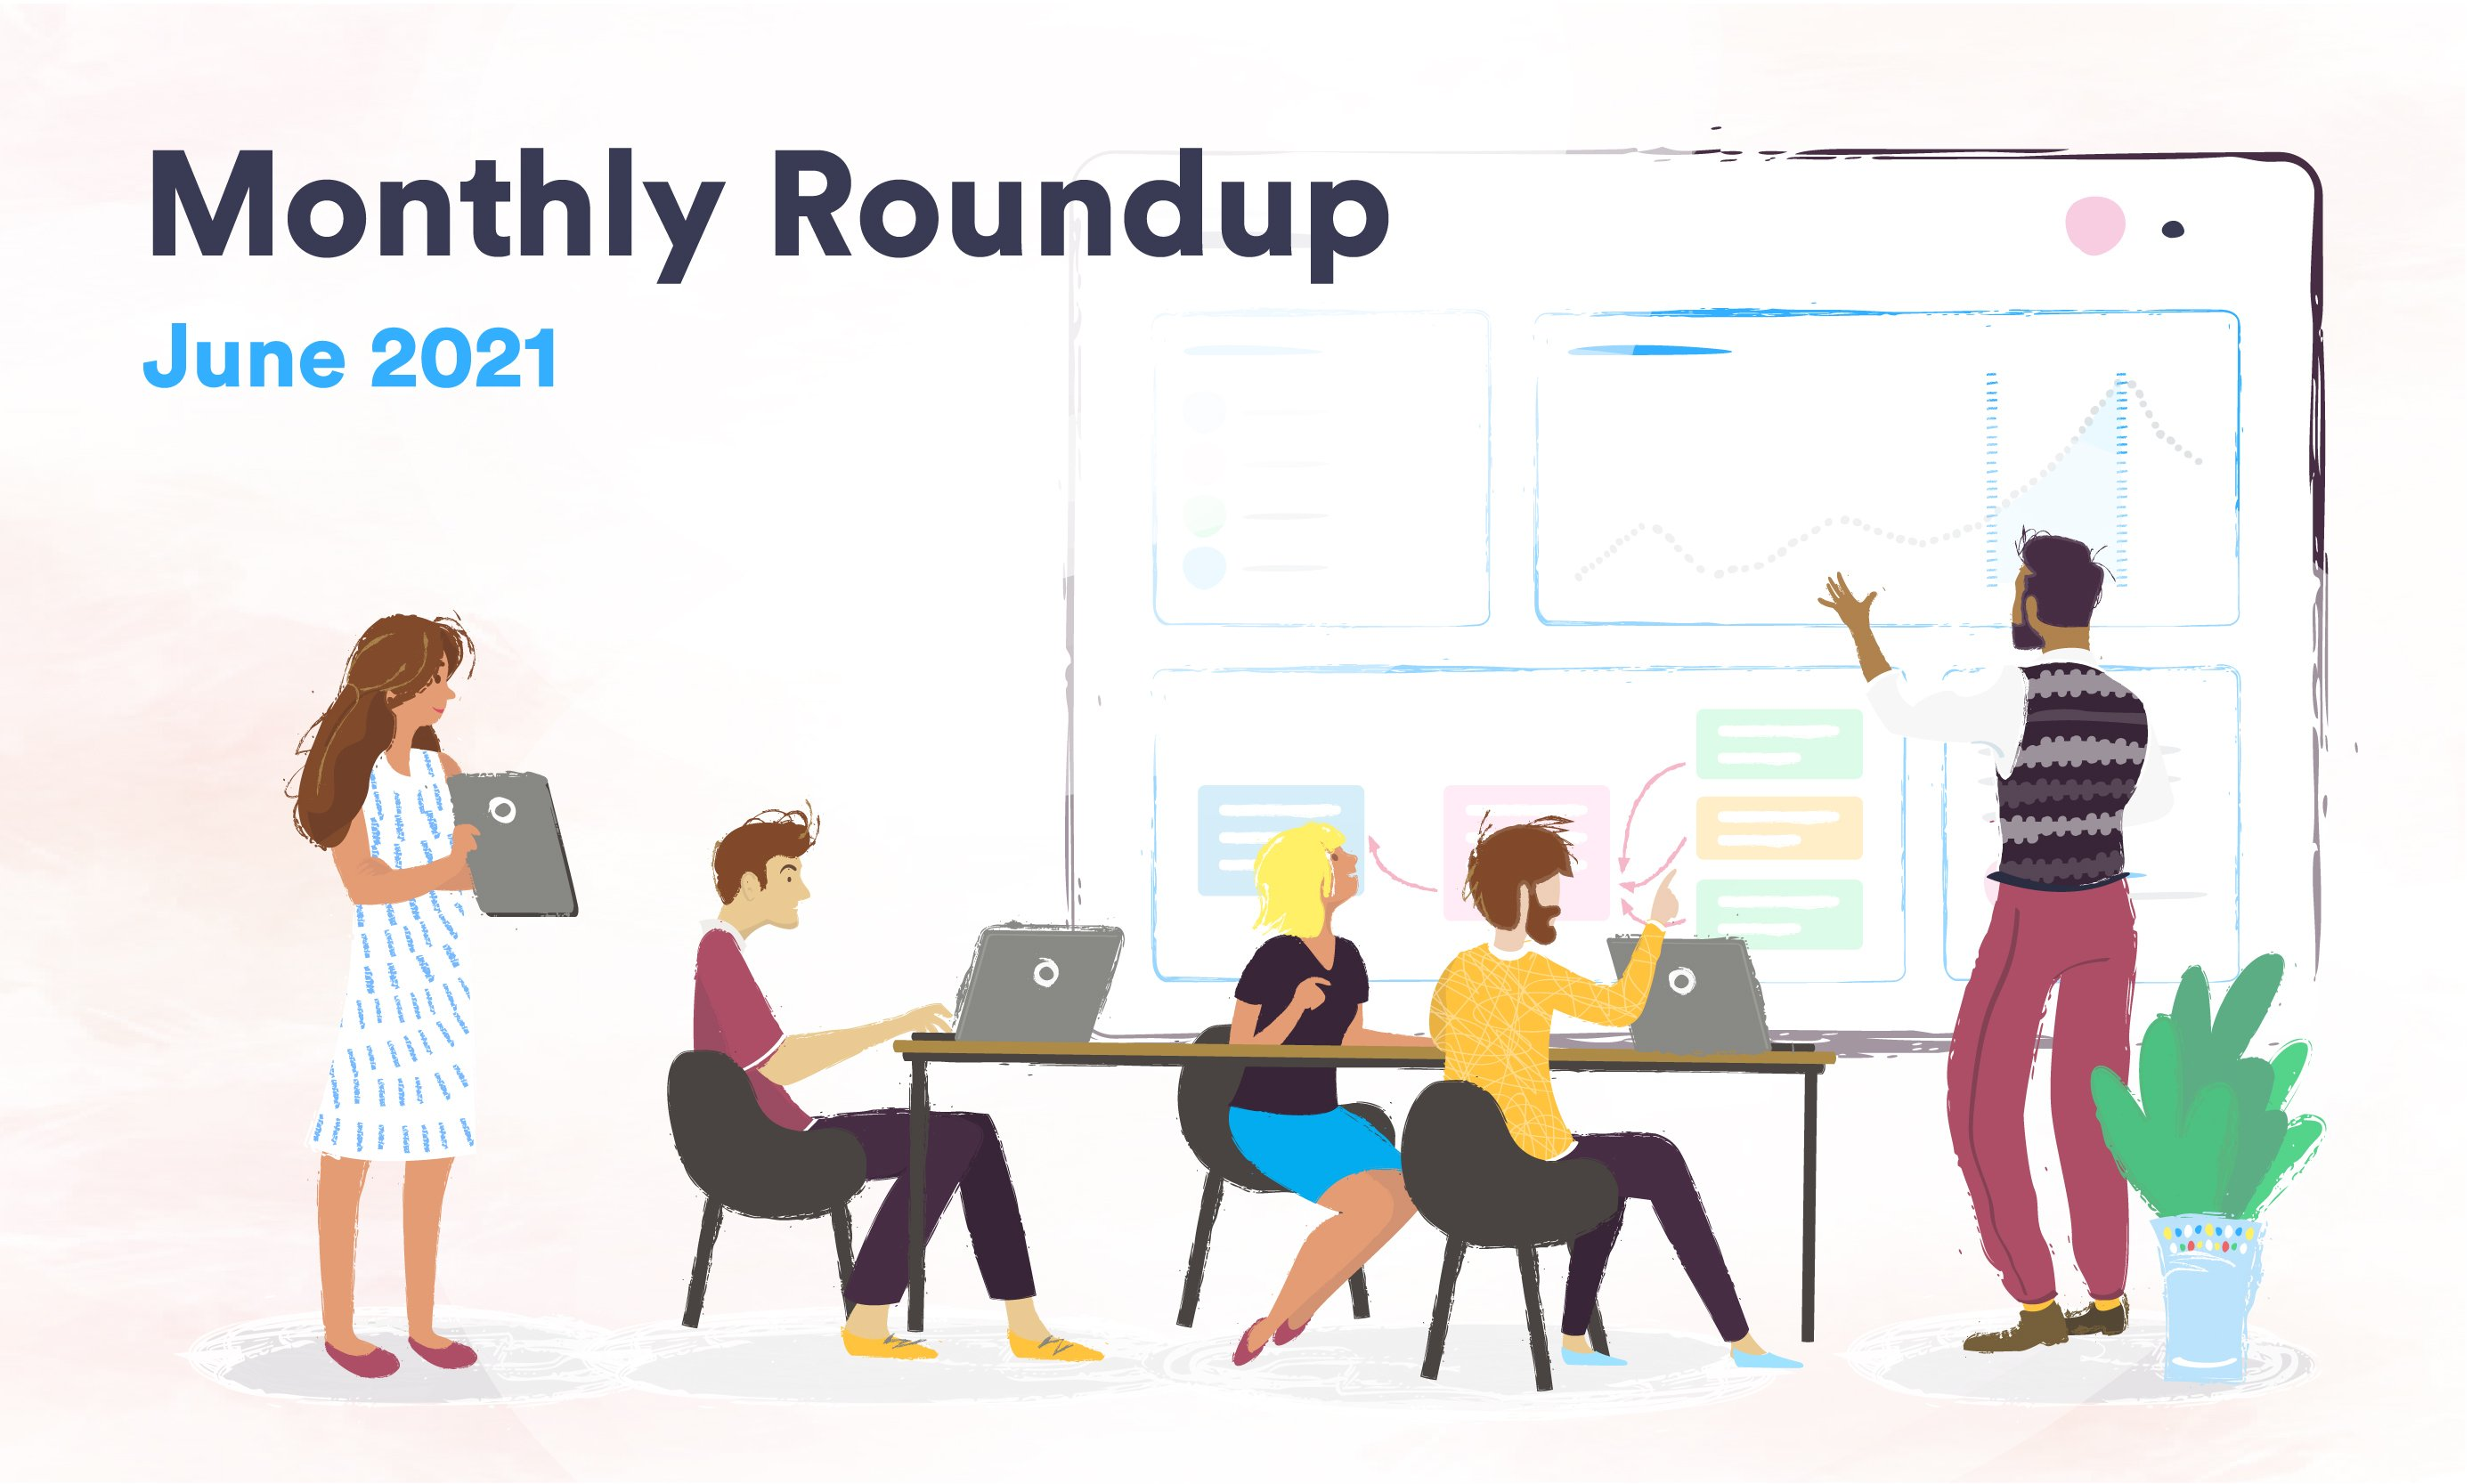 June Roundup 2021